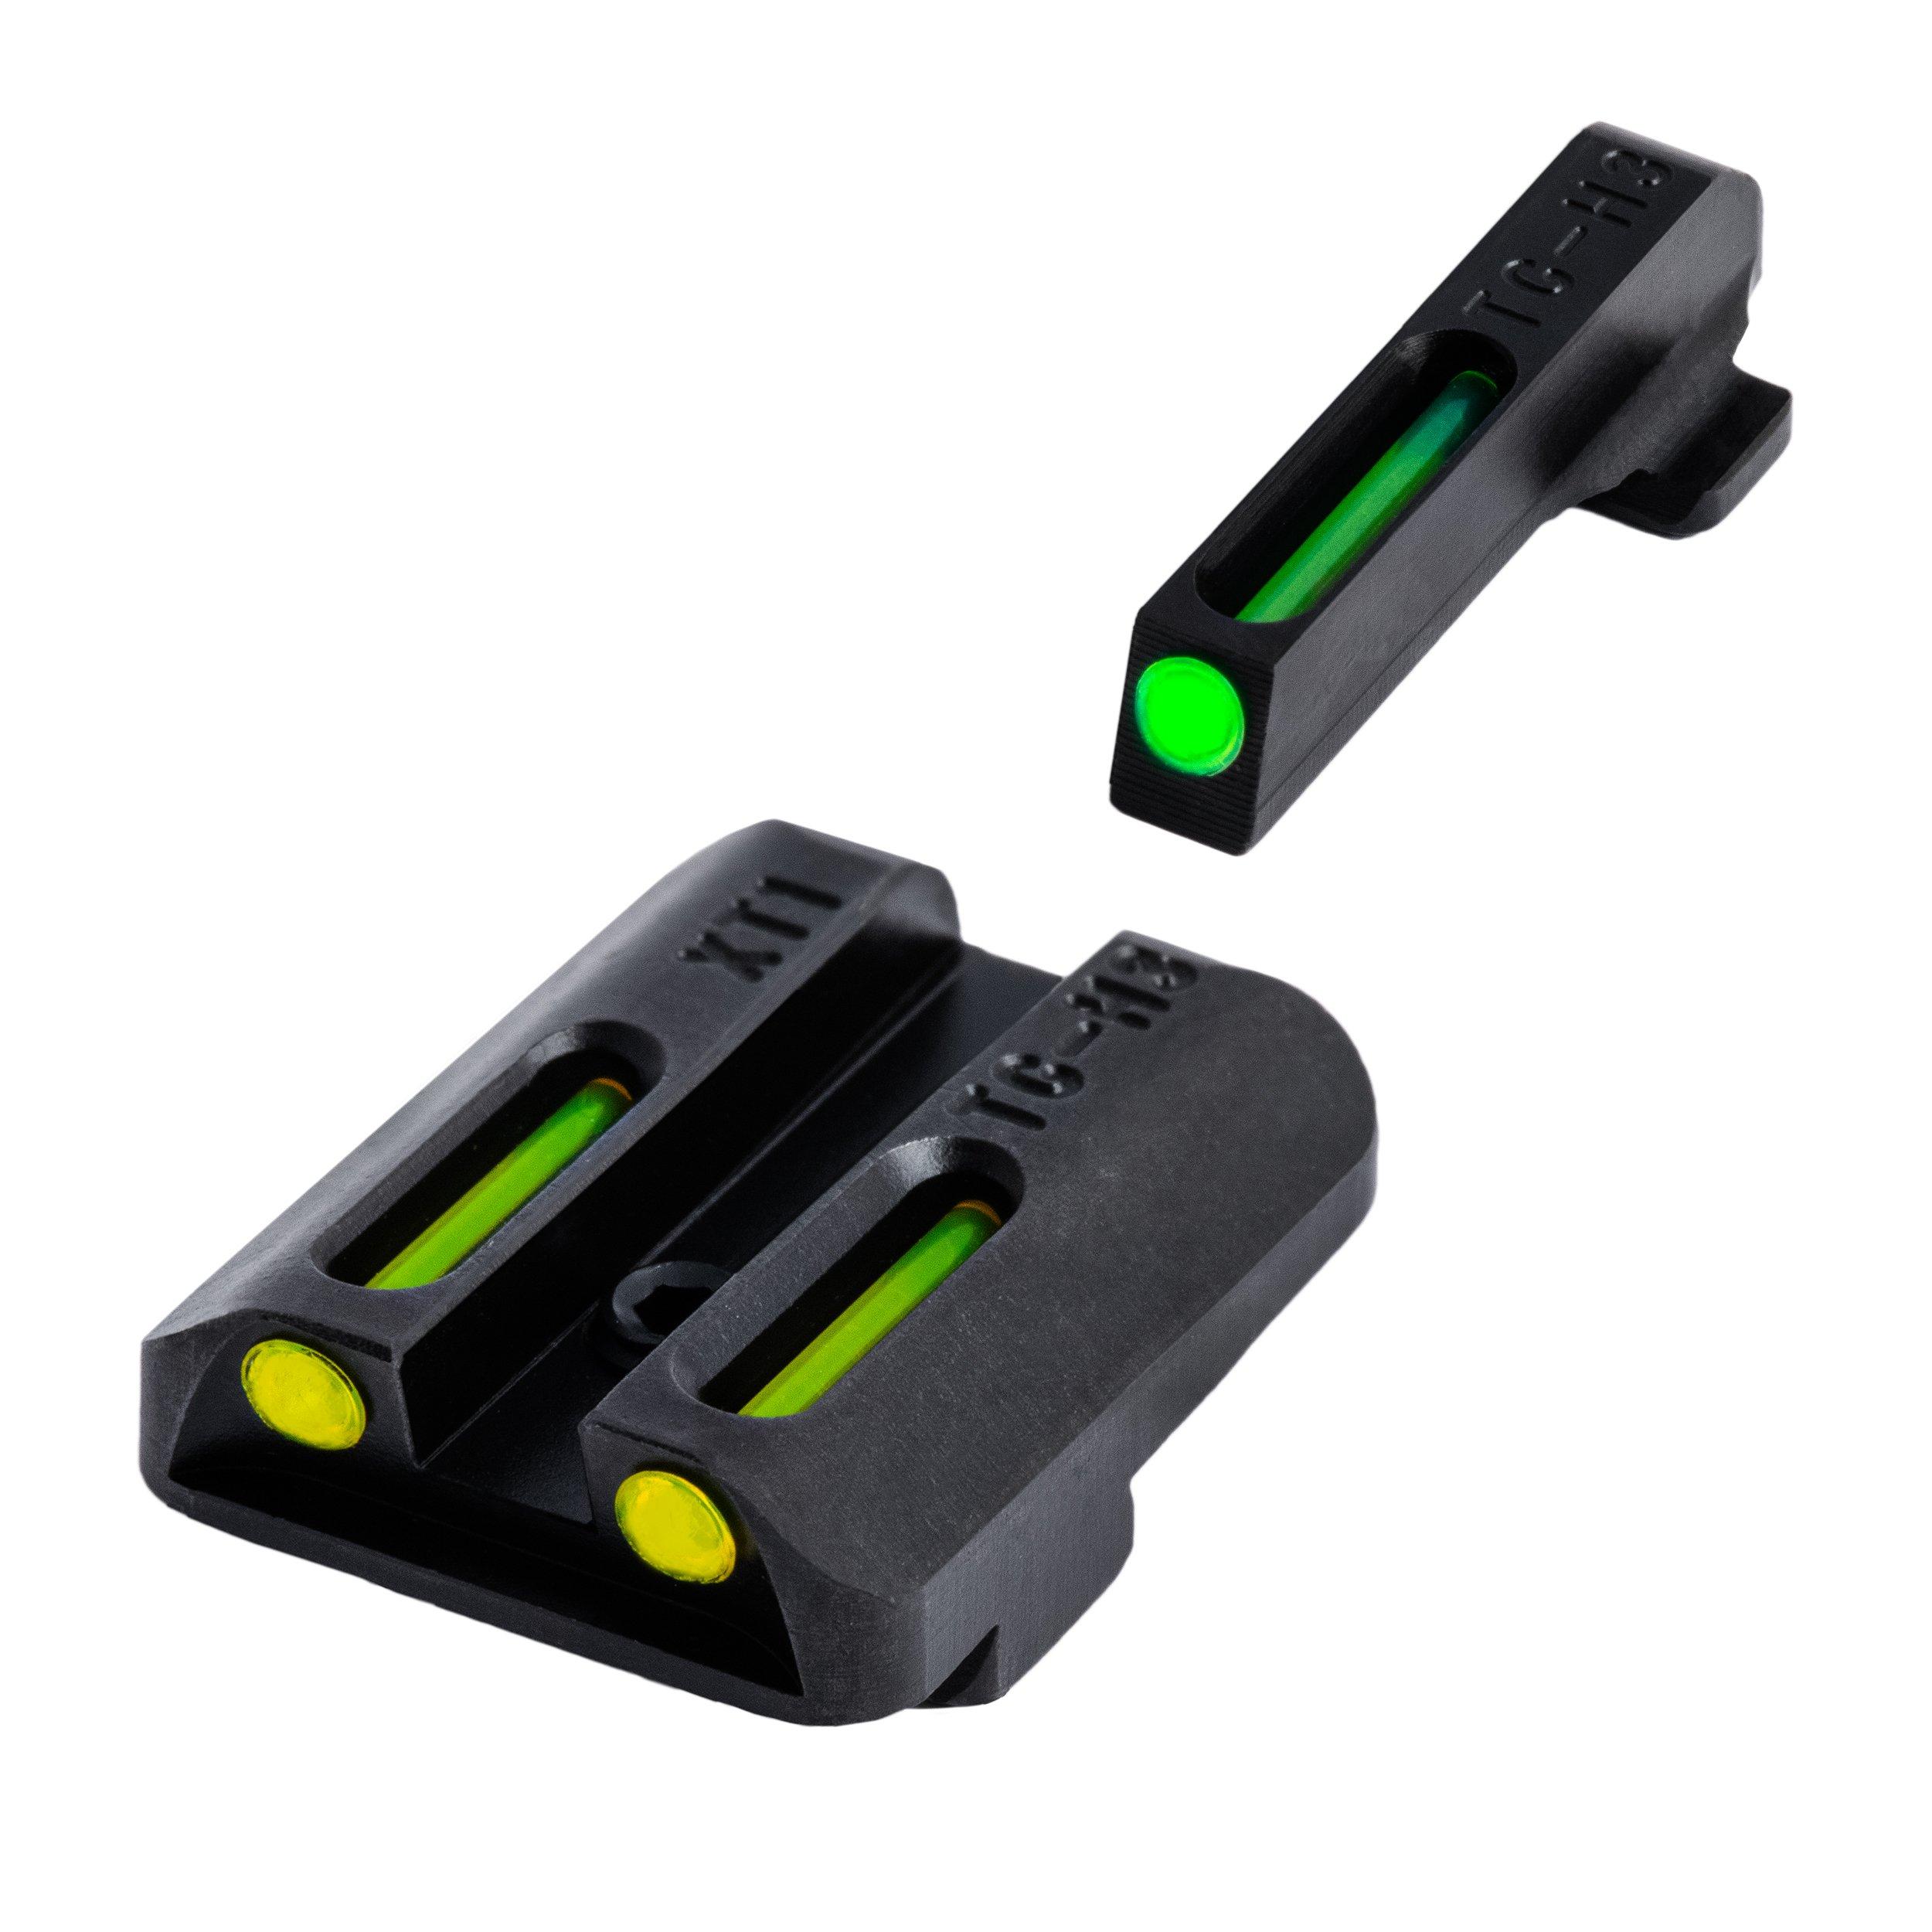 TRUGLO TFO Handgun Sight Set - Springfield XD, XDM, XDS - Green/Yellow Rear by TRUGLO